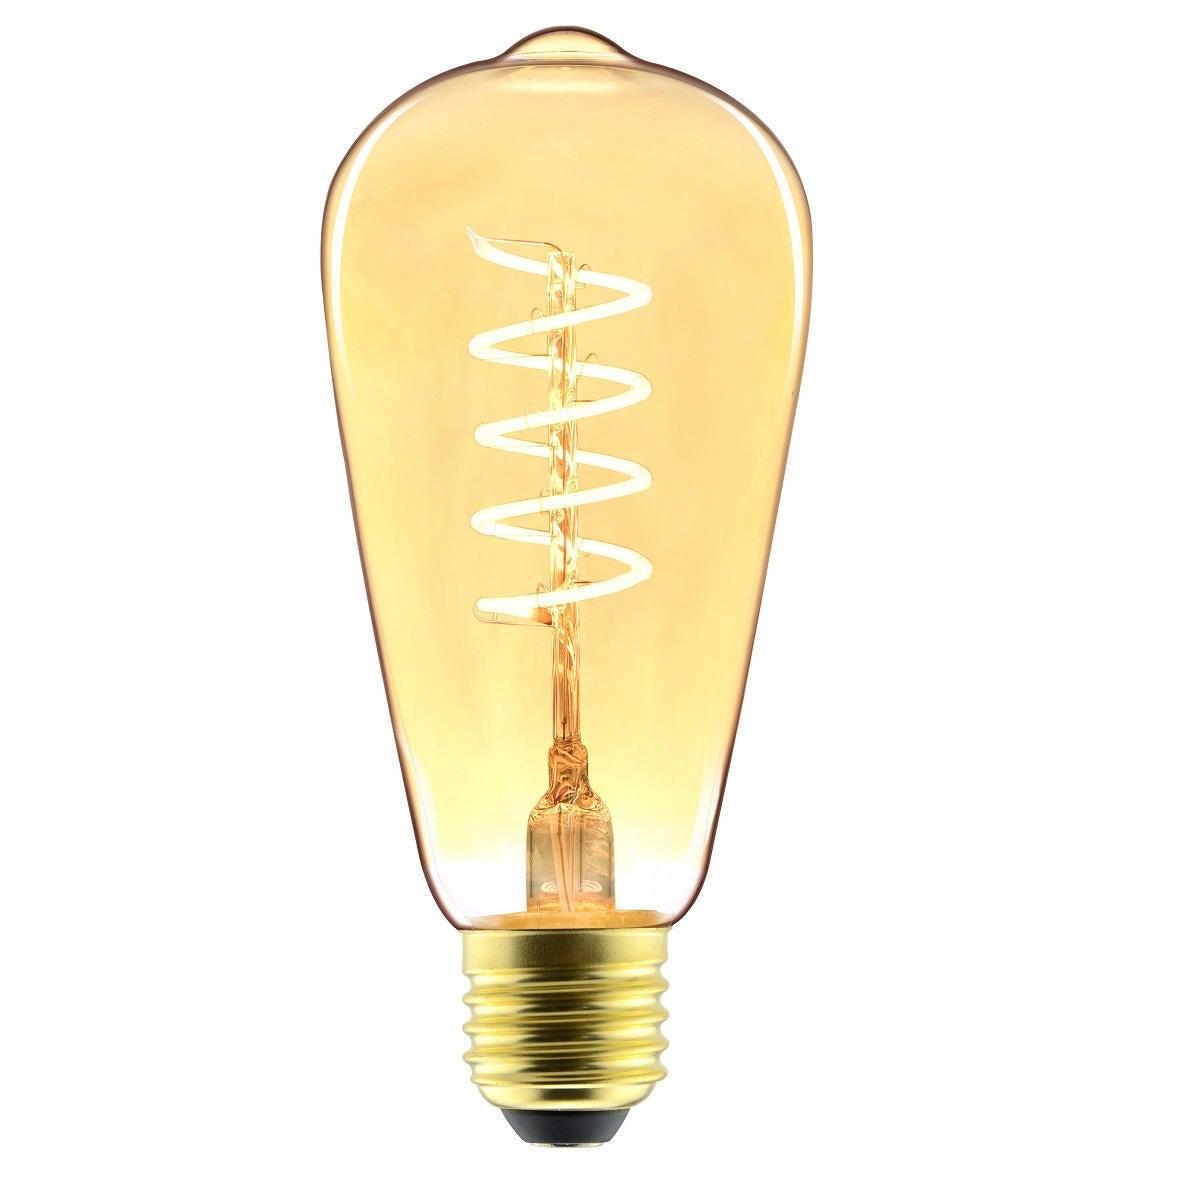 Lampadina decorativa LED filamento, Big Spiral, E27, Goccia, Ambra, Luce calda, 5W=250LM (equiv 25 W), 330° , LEXMAN